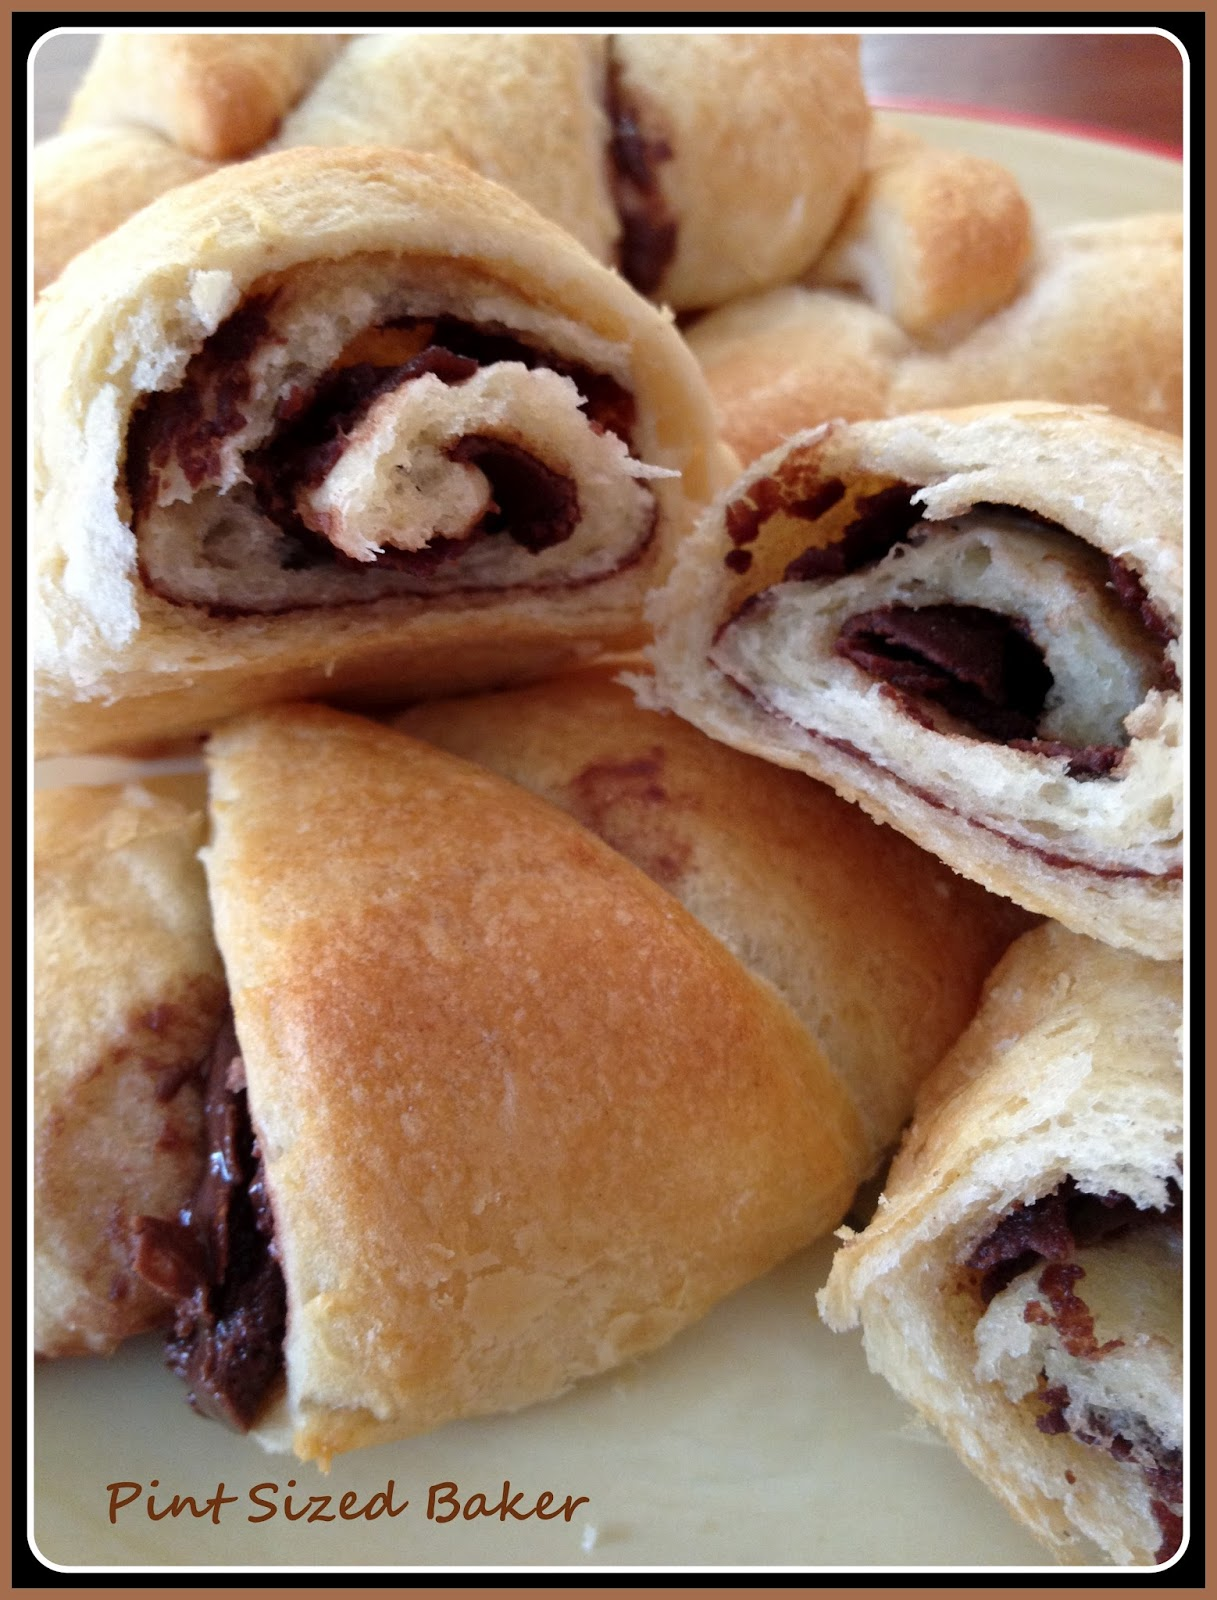 Pint Sized Baker: Chocolate Peanut Butter Crescent Rolls